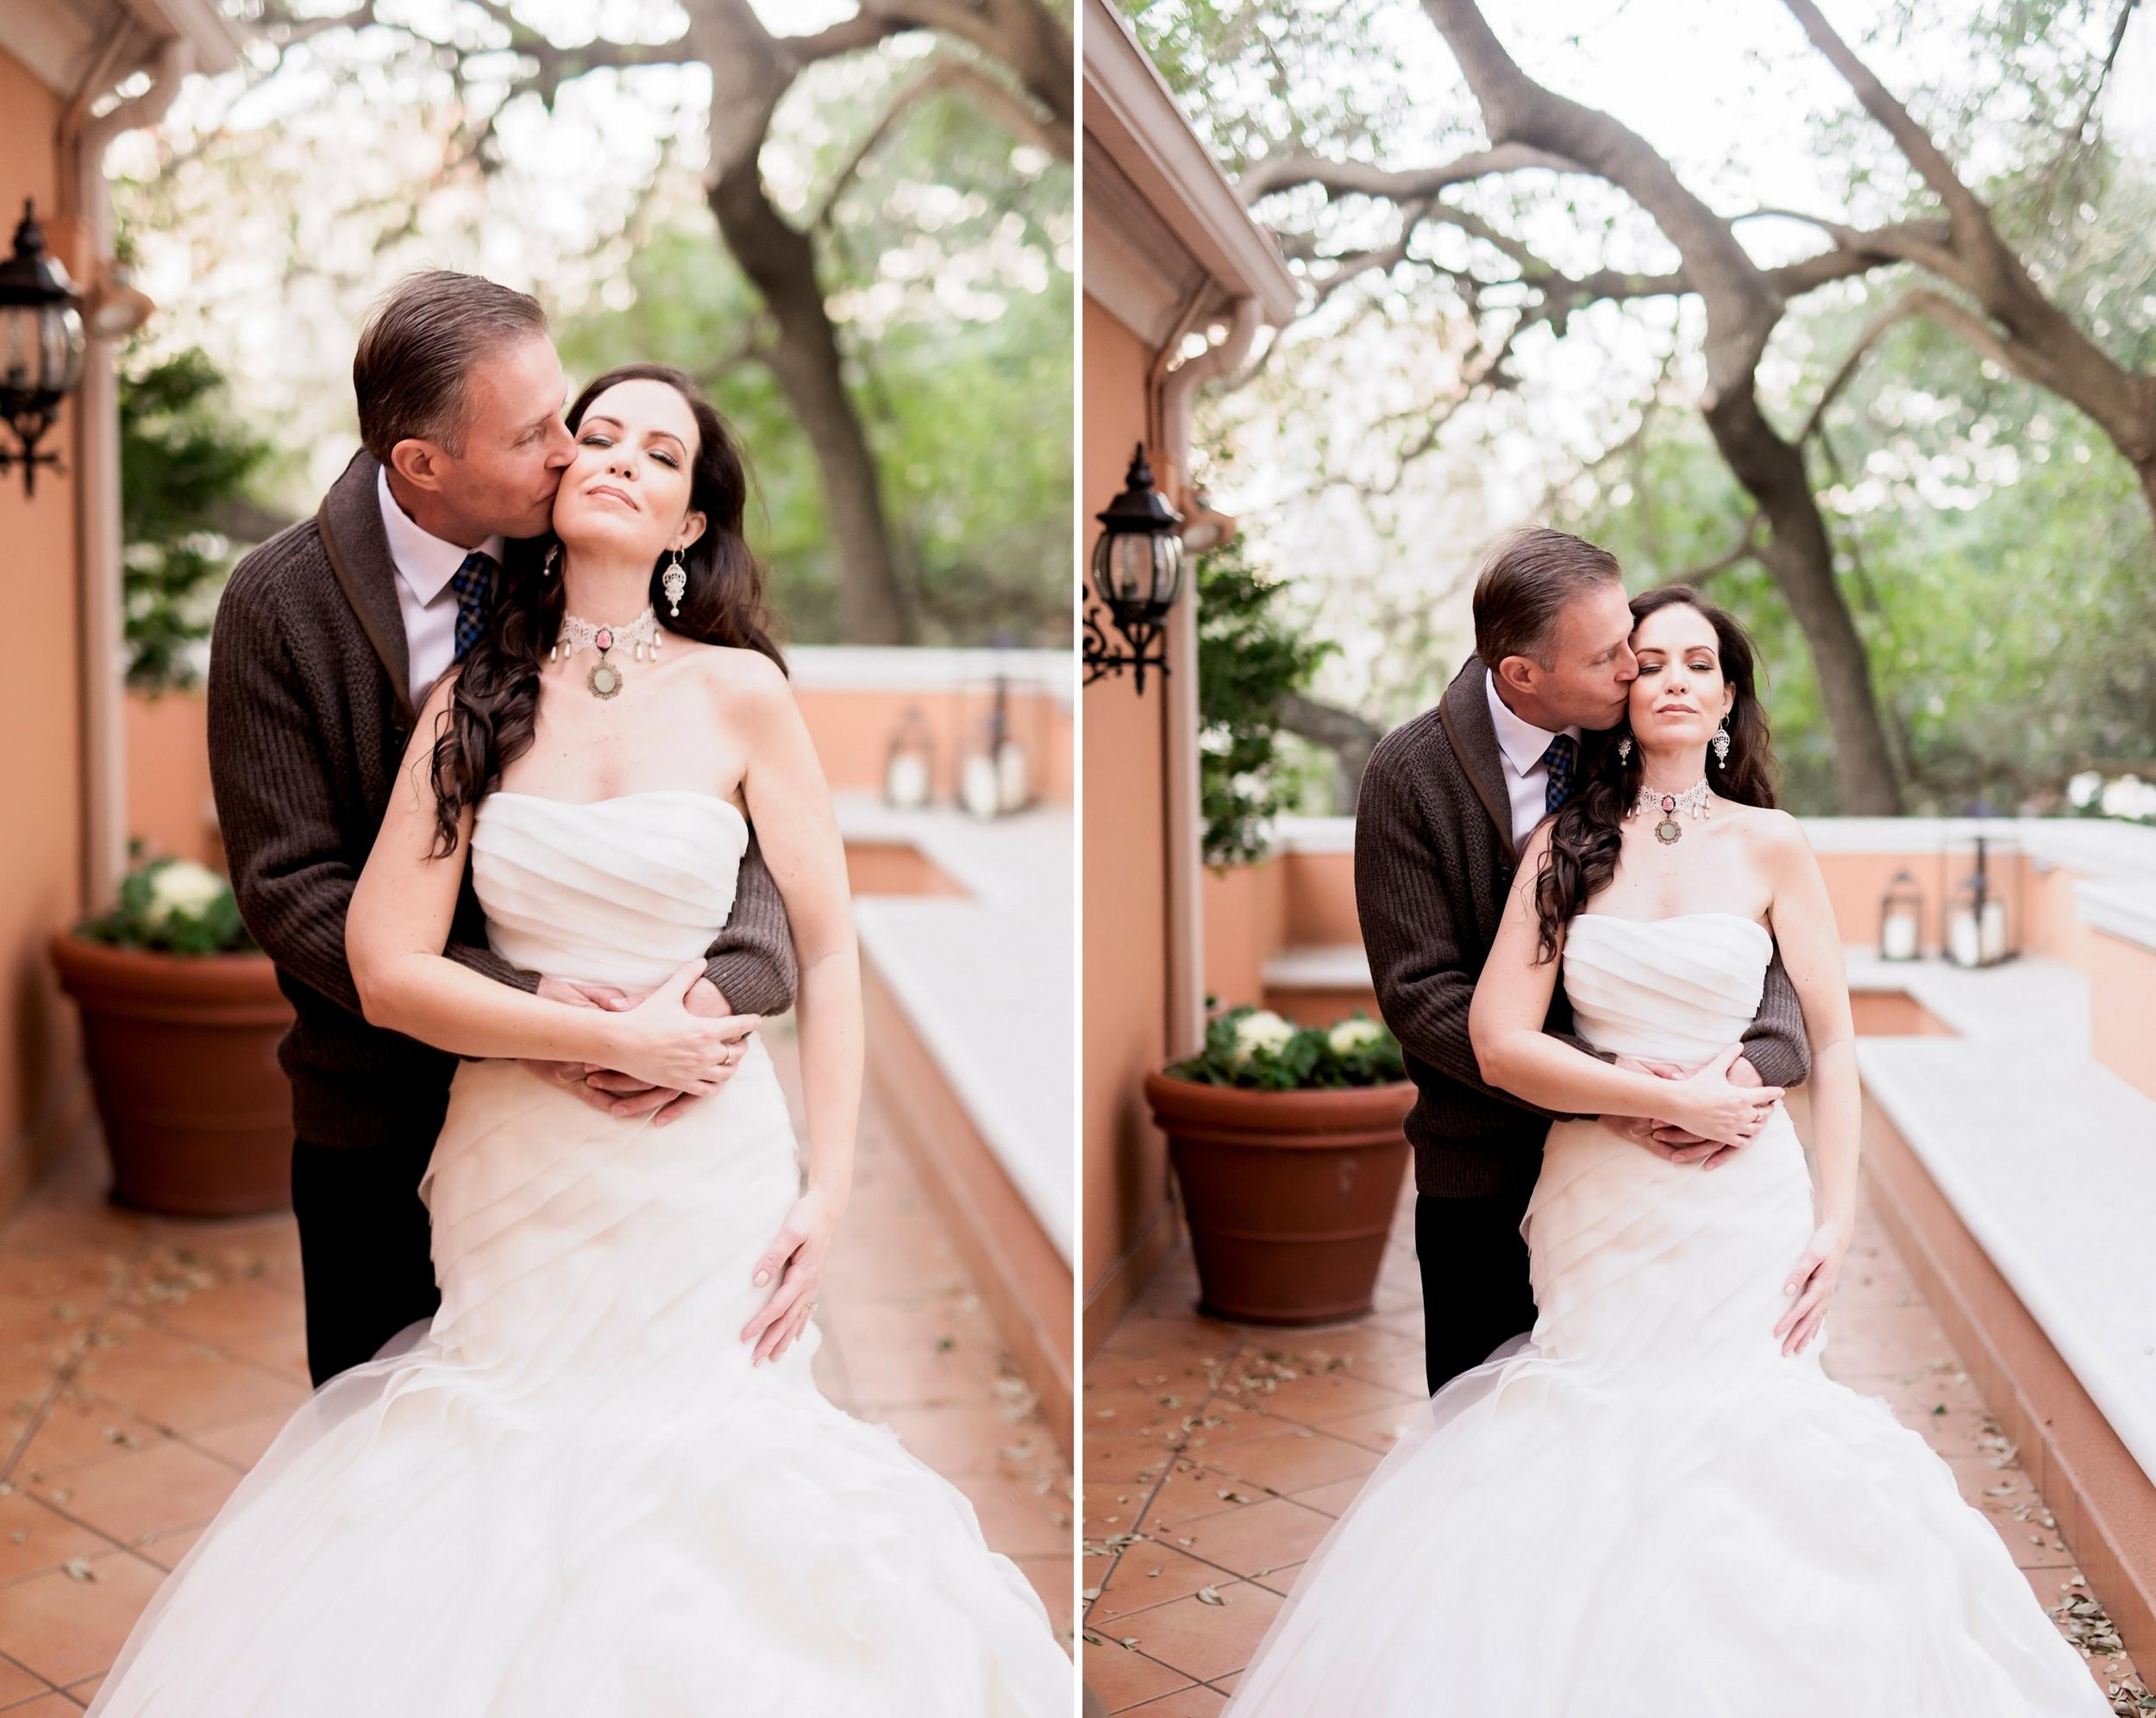 Heather-Jack-Wedding-Pharris-Photography-13.jpg